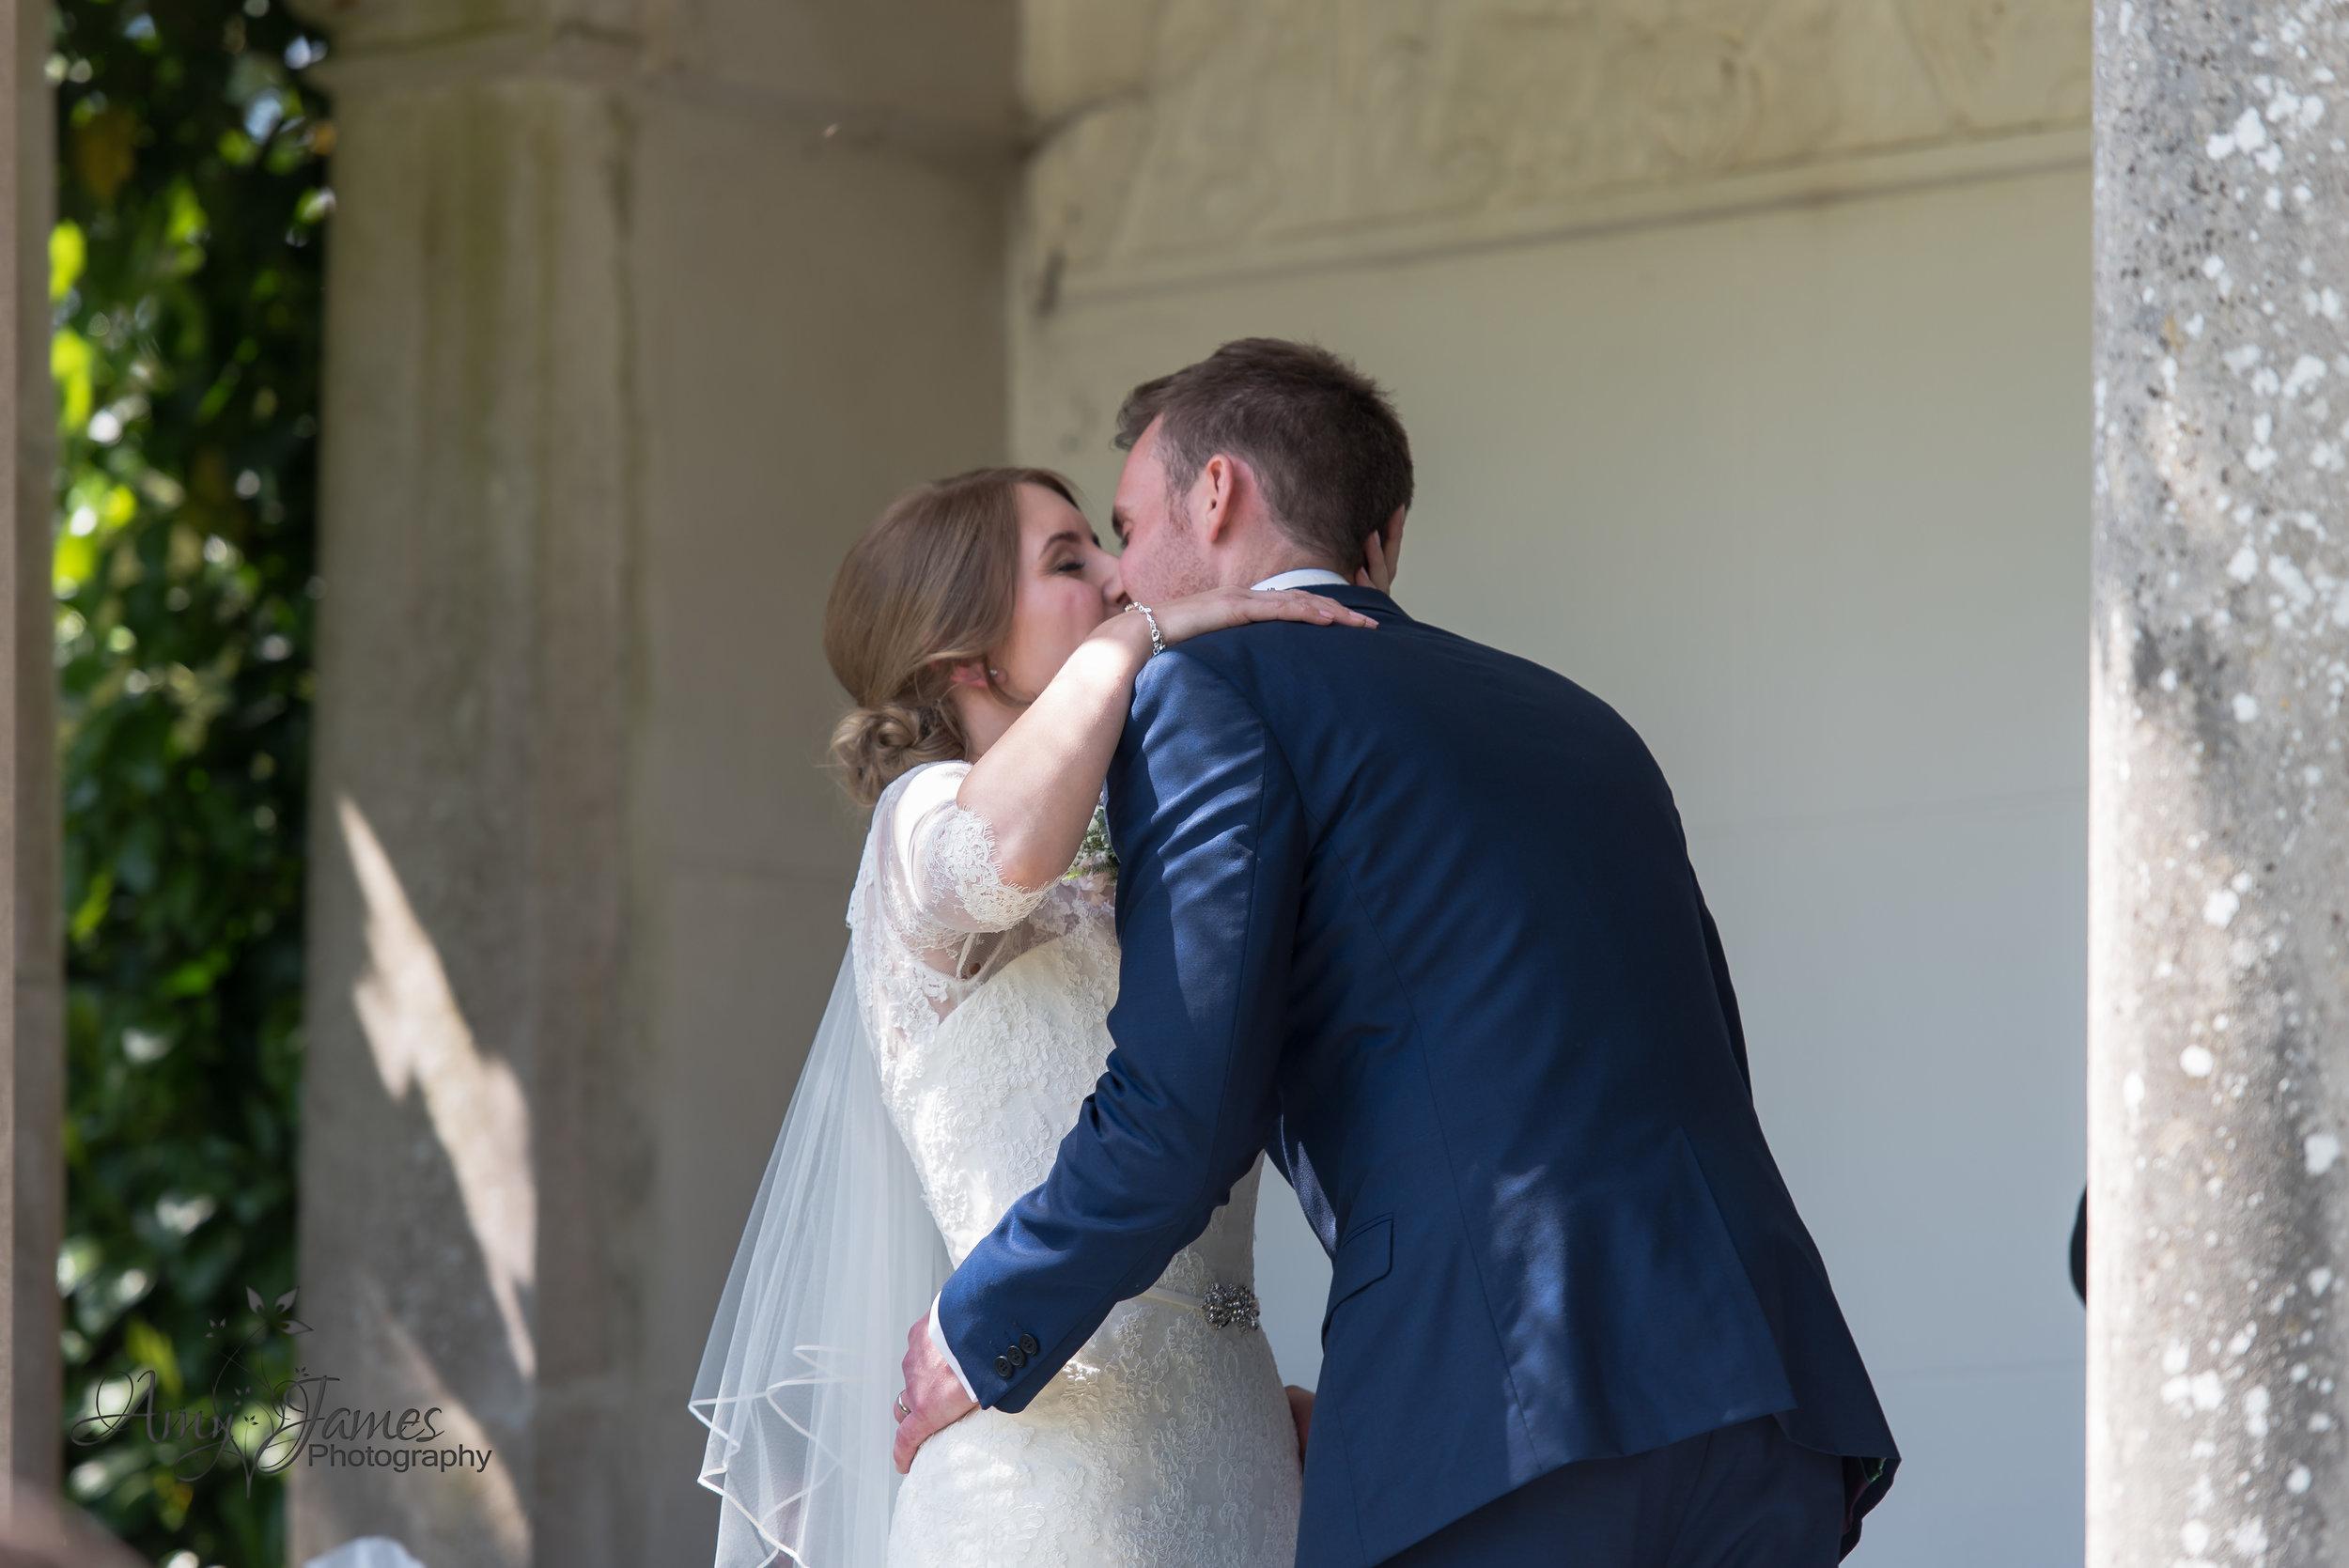 Highfield Park Wedding venue | Highfield Park Hampshire Wedding Photographer | UK Outdoor wedding venue | Amy James Photography Fleet Wedding Photographer